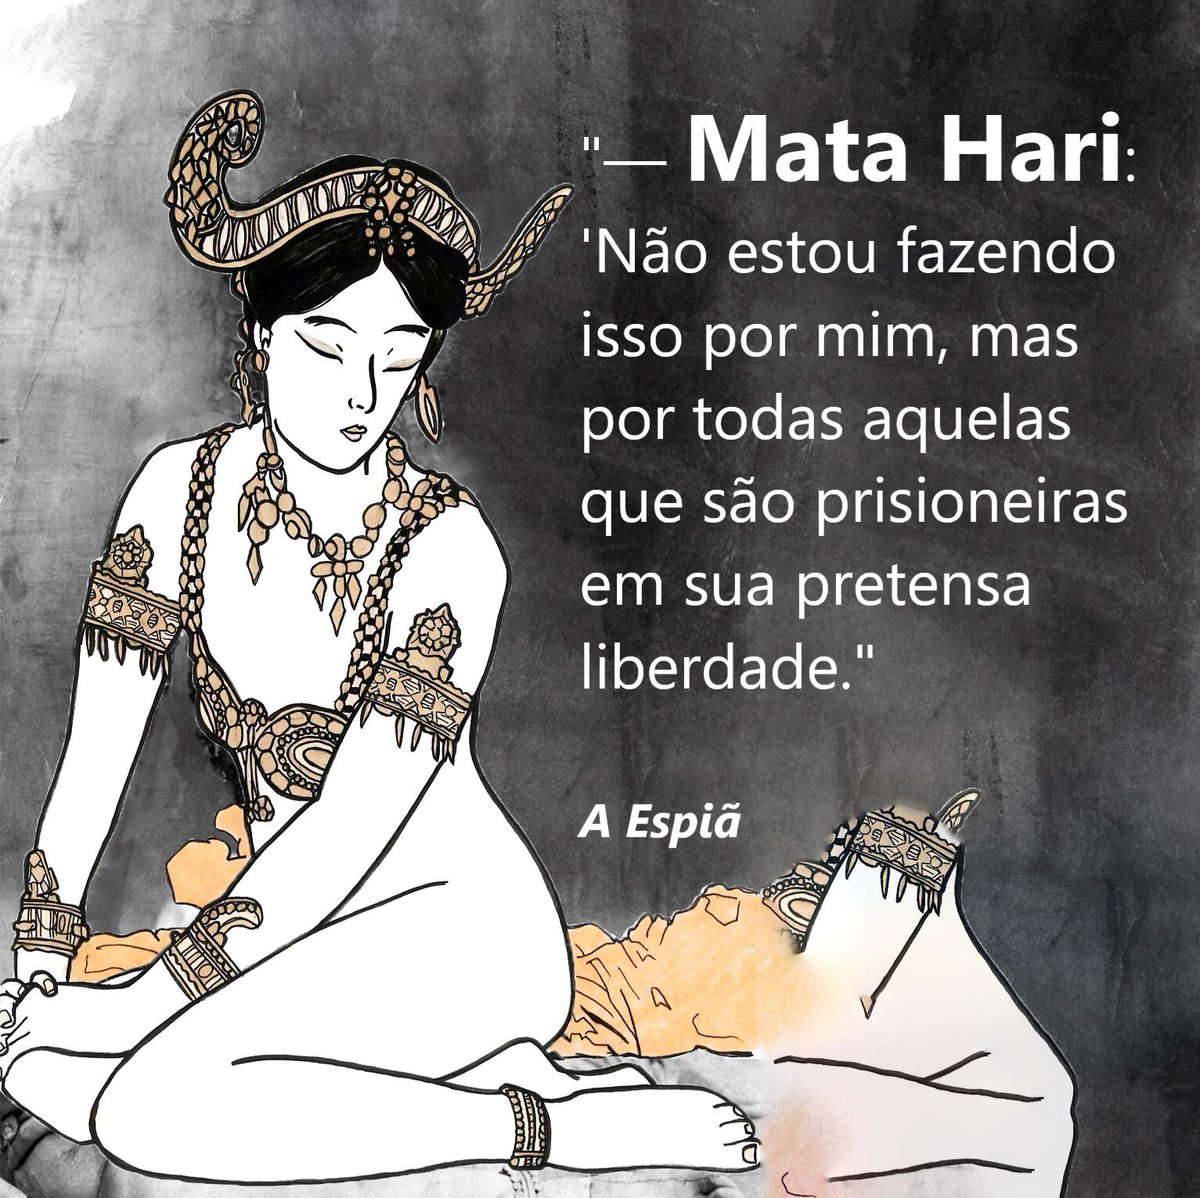 RT @paulocoelho: #diainternacionaldamulher https://t.co/VfVLg01ZSf